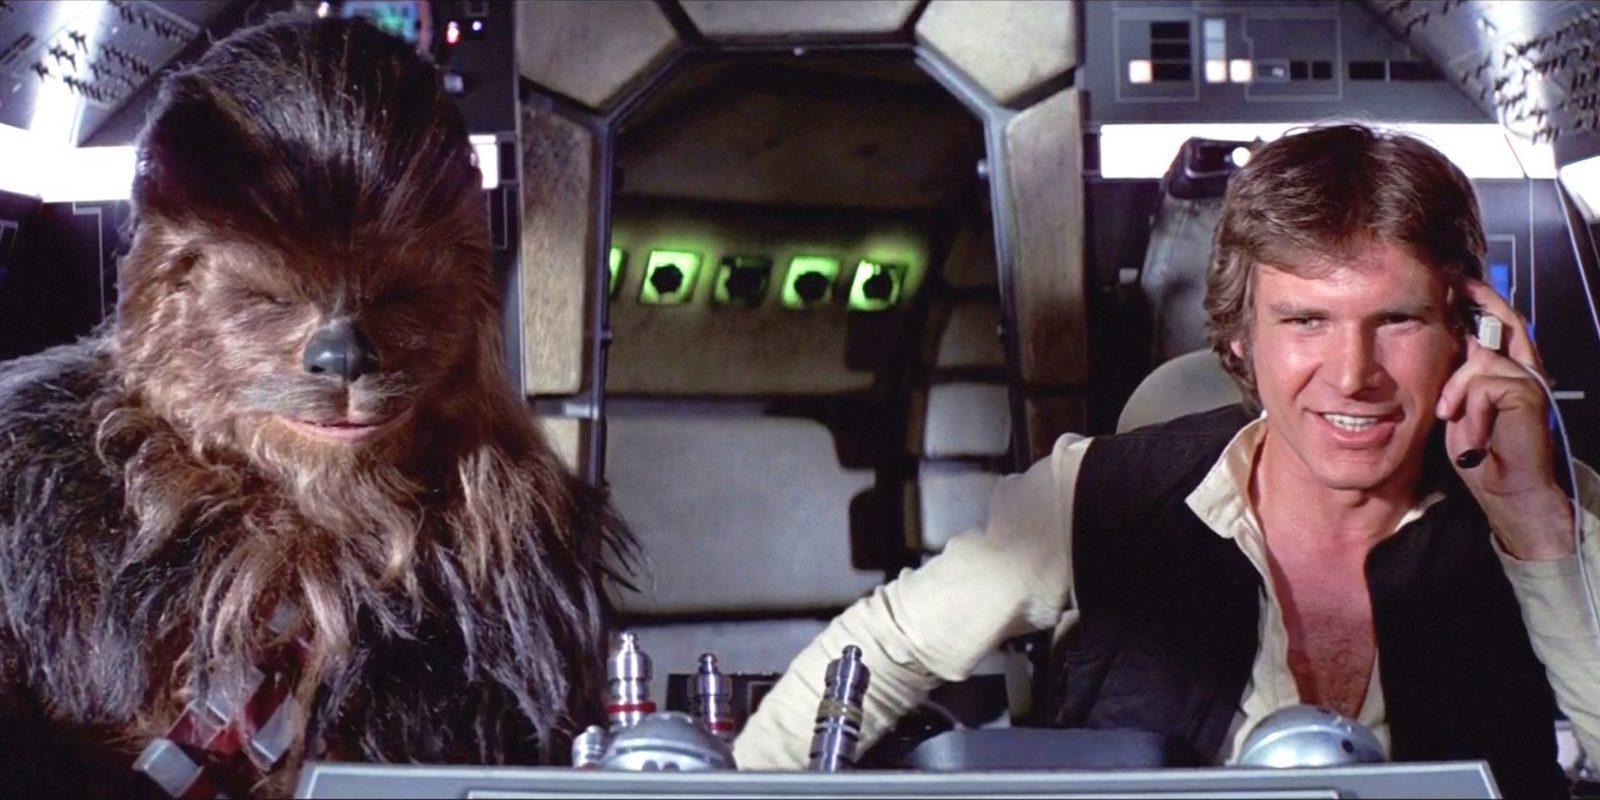 Han Solo and Chewbacca in the Millennium Falcon